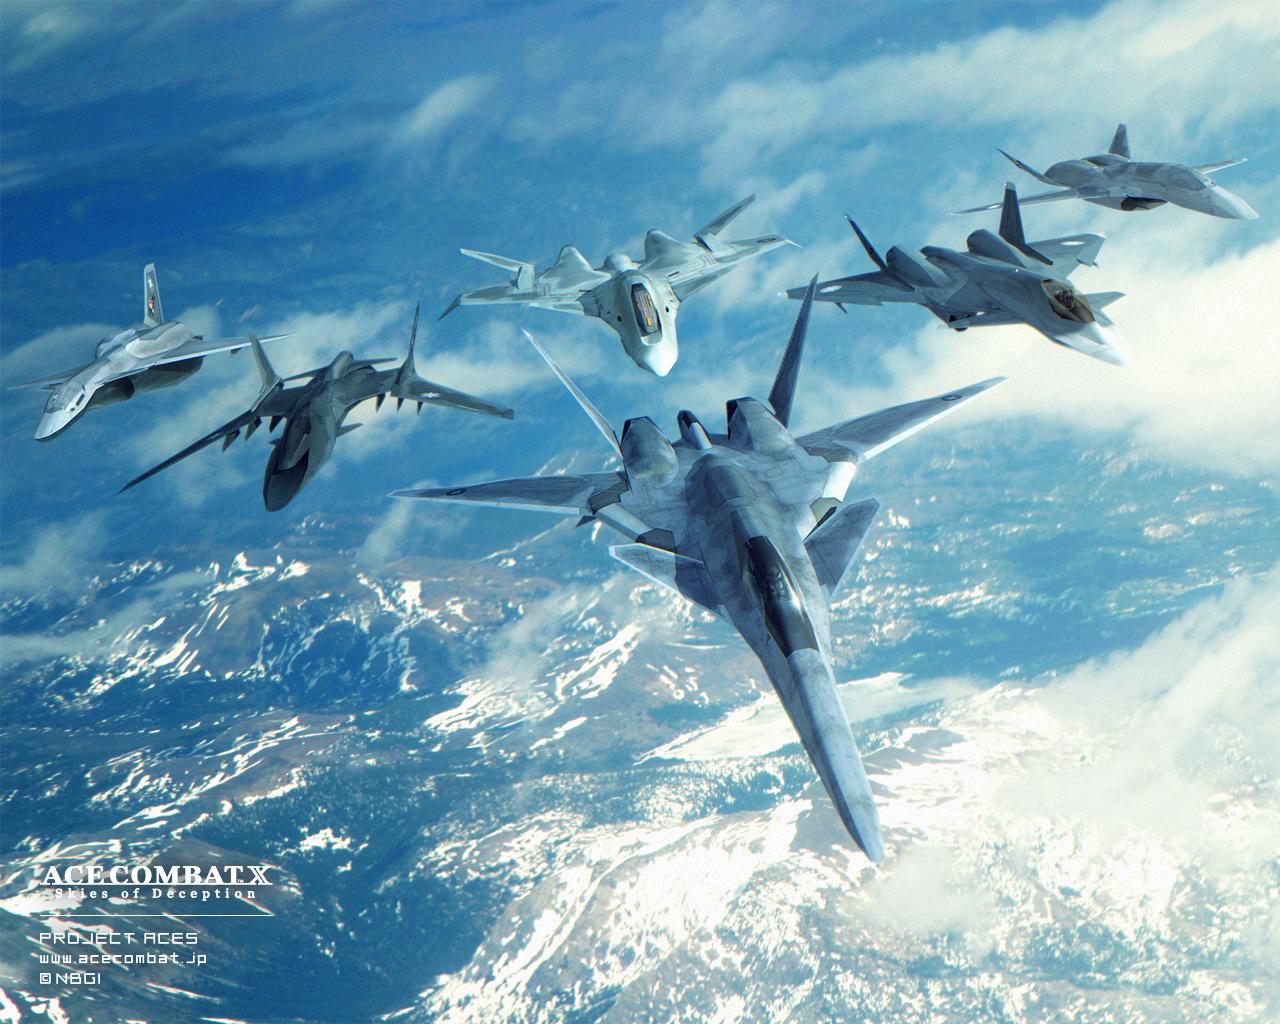 Ace Combat X Special Wallpaper 1280x1024.jpg